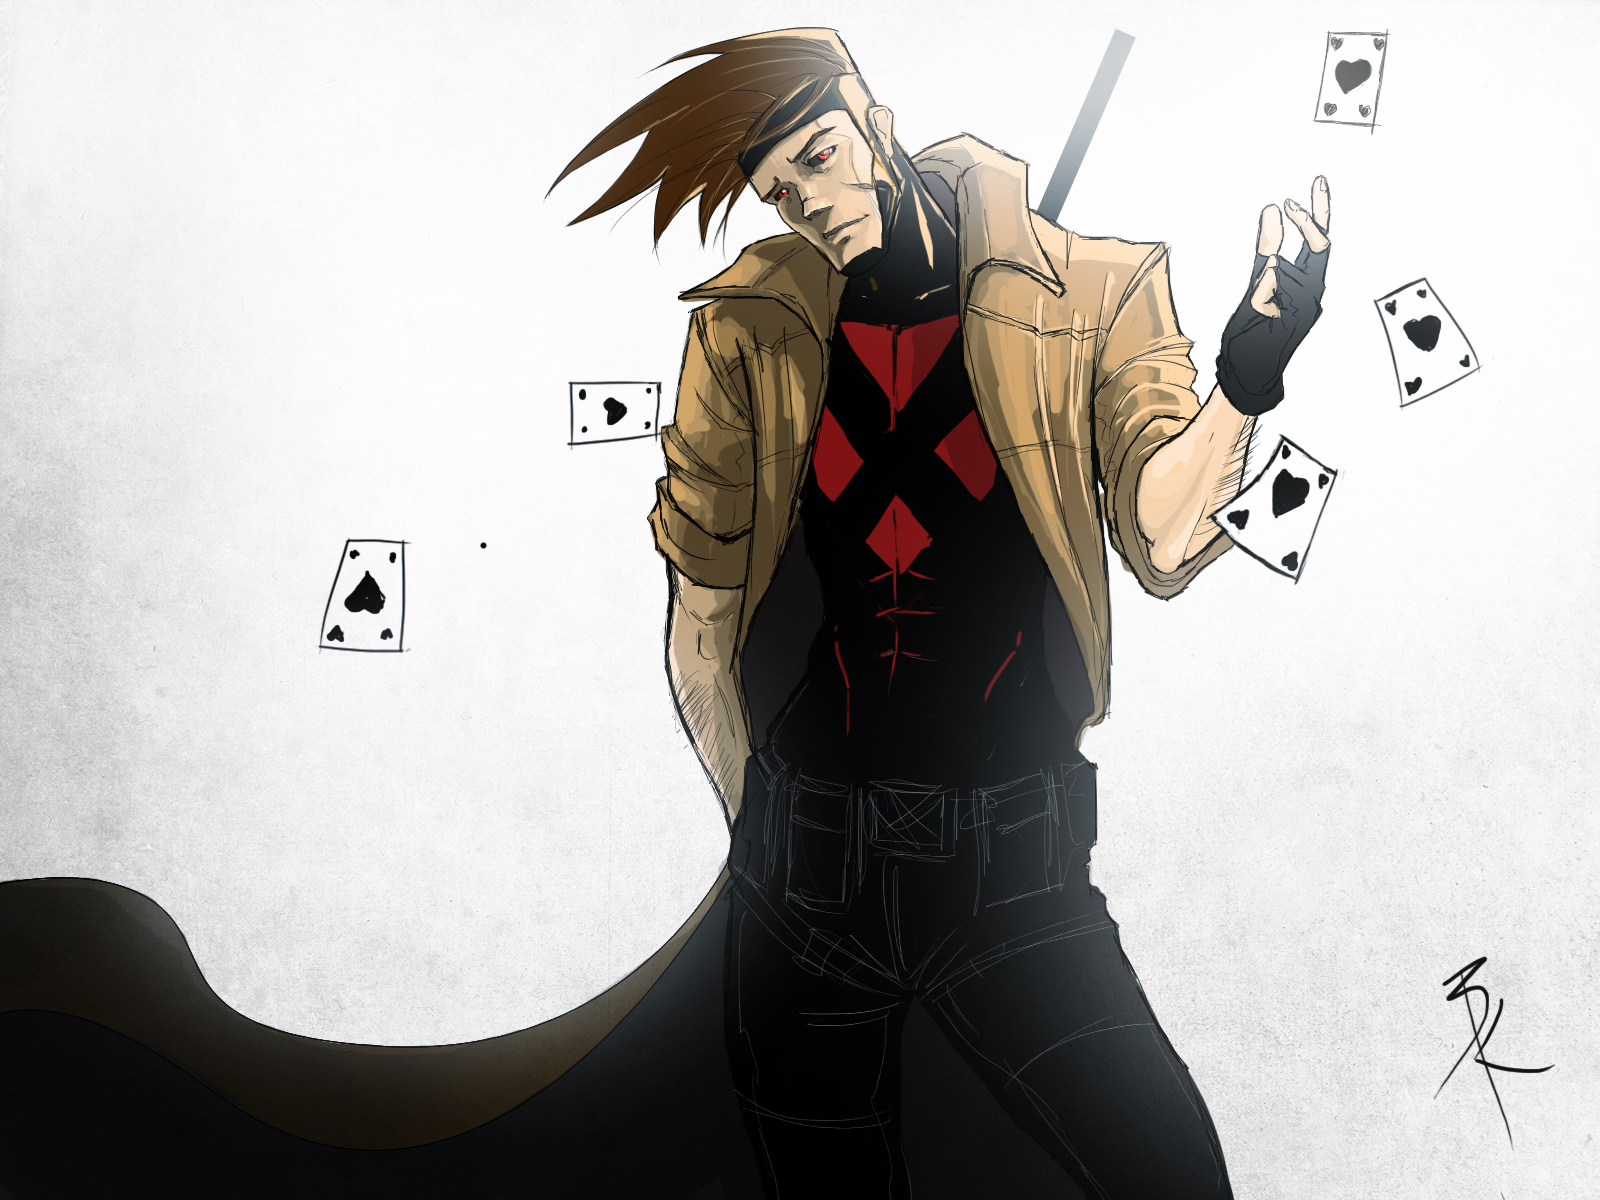 Gambit 02 by TheBabman